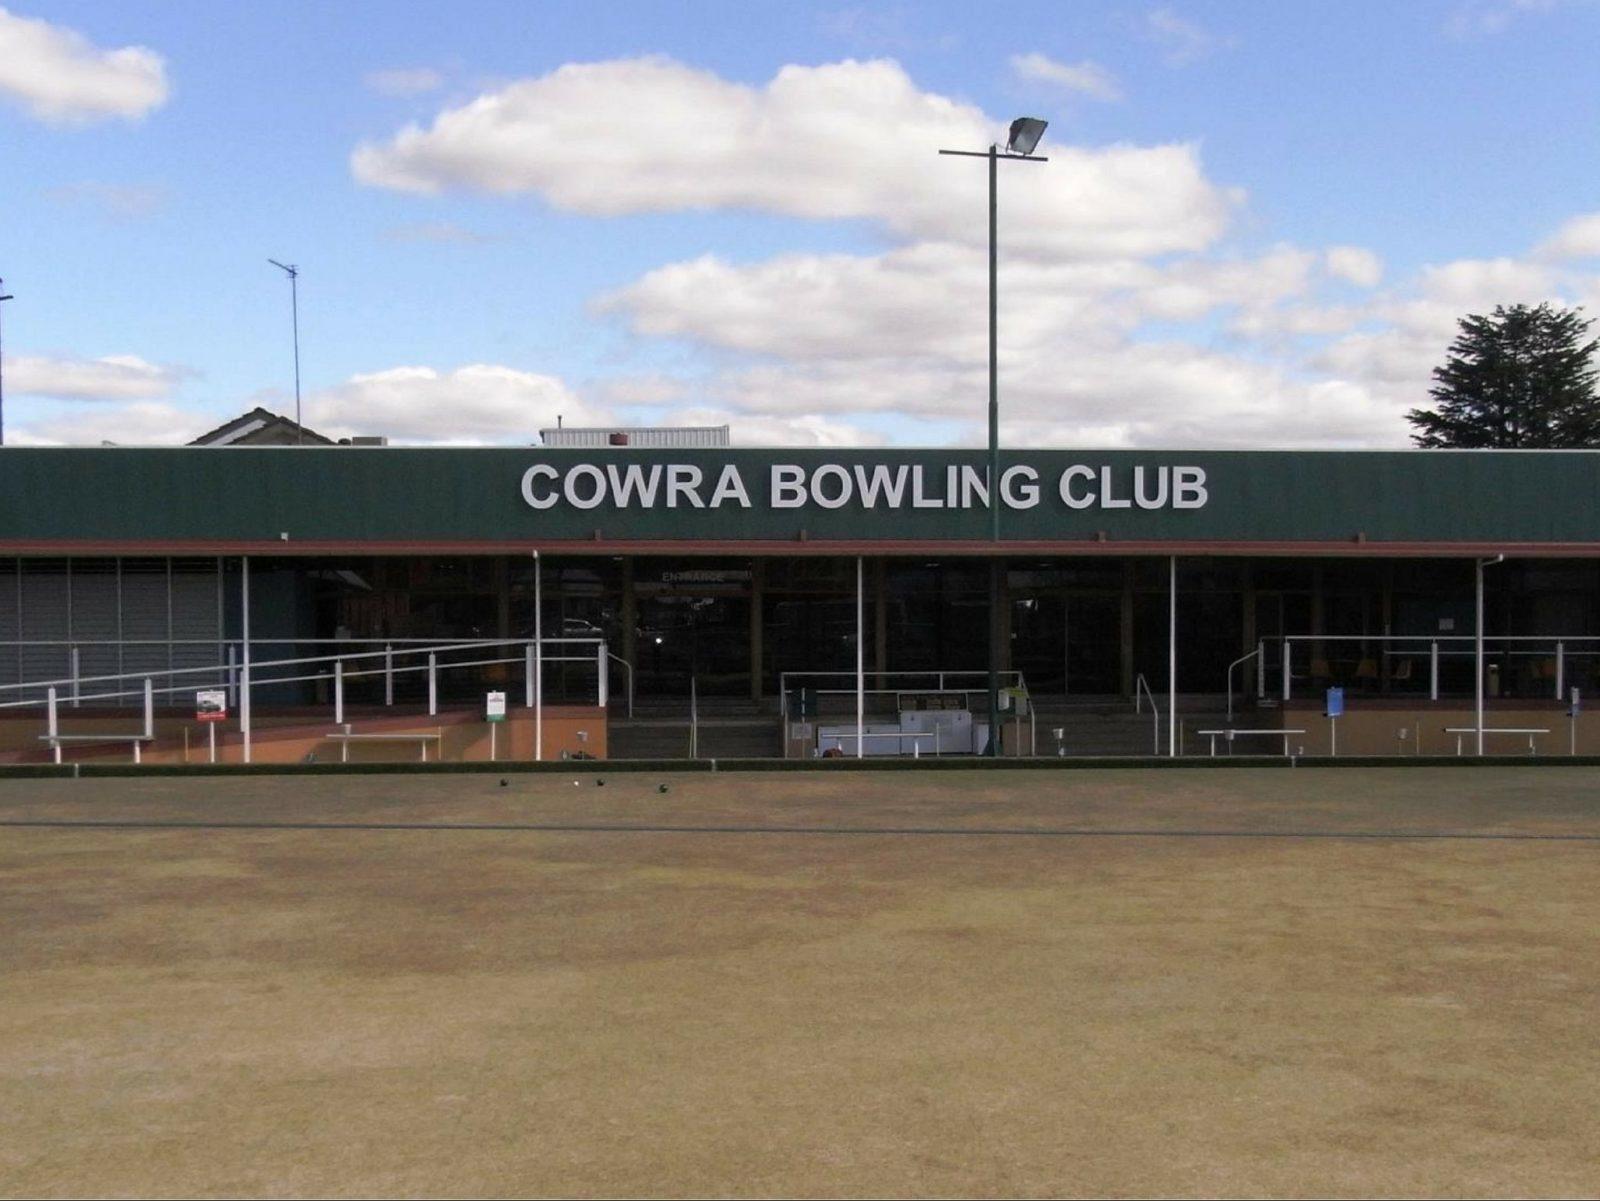 Cowra Bowling Club